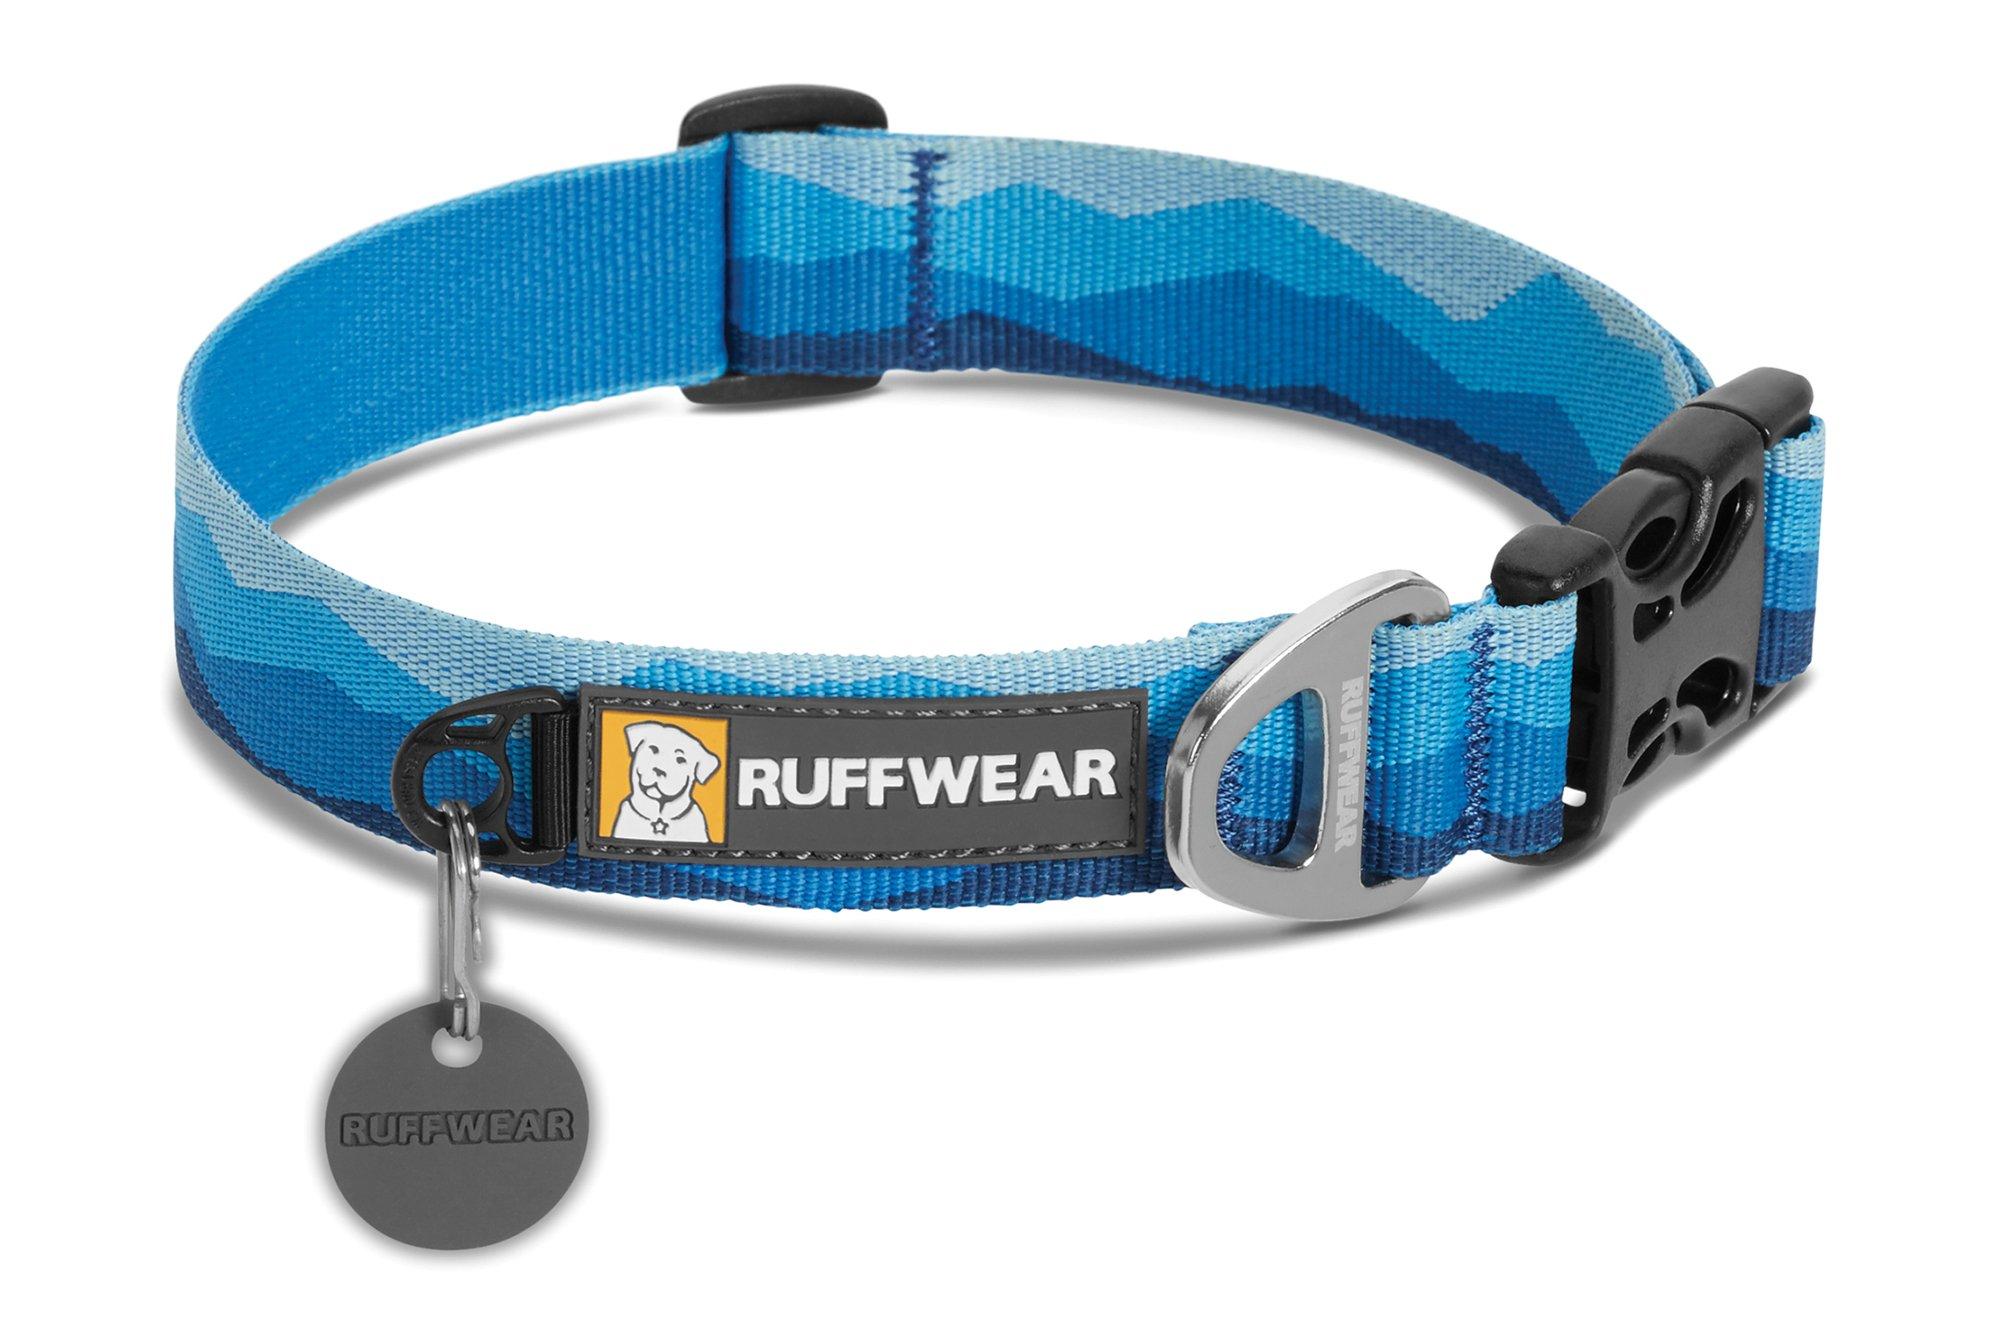 RUFFWEAR - Hoopie Collar, Blue Mountains, Medium (2018), 14-20 ''